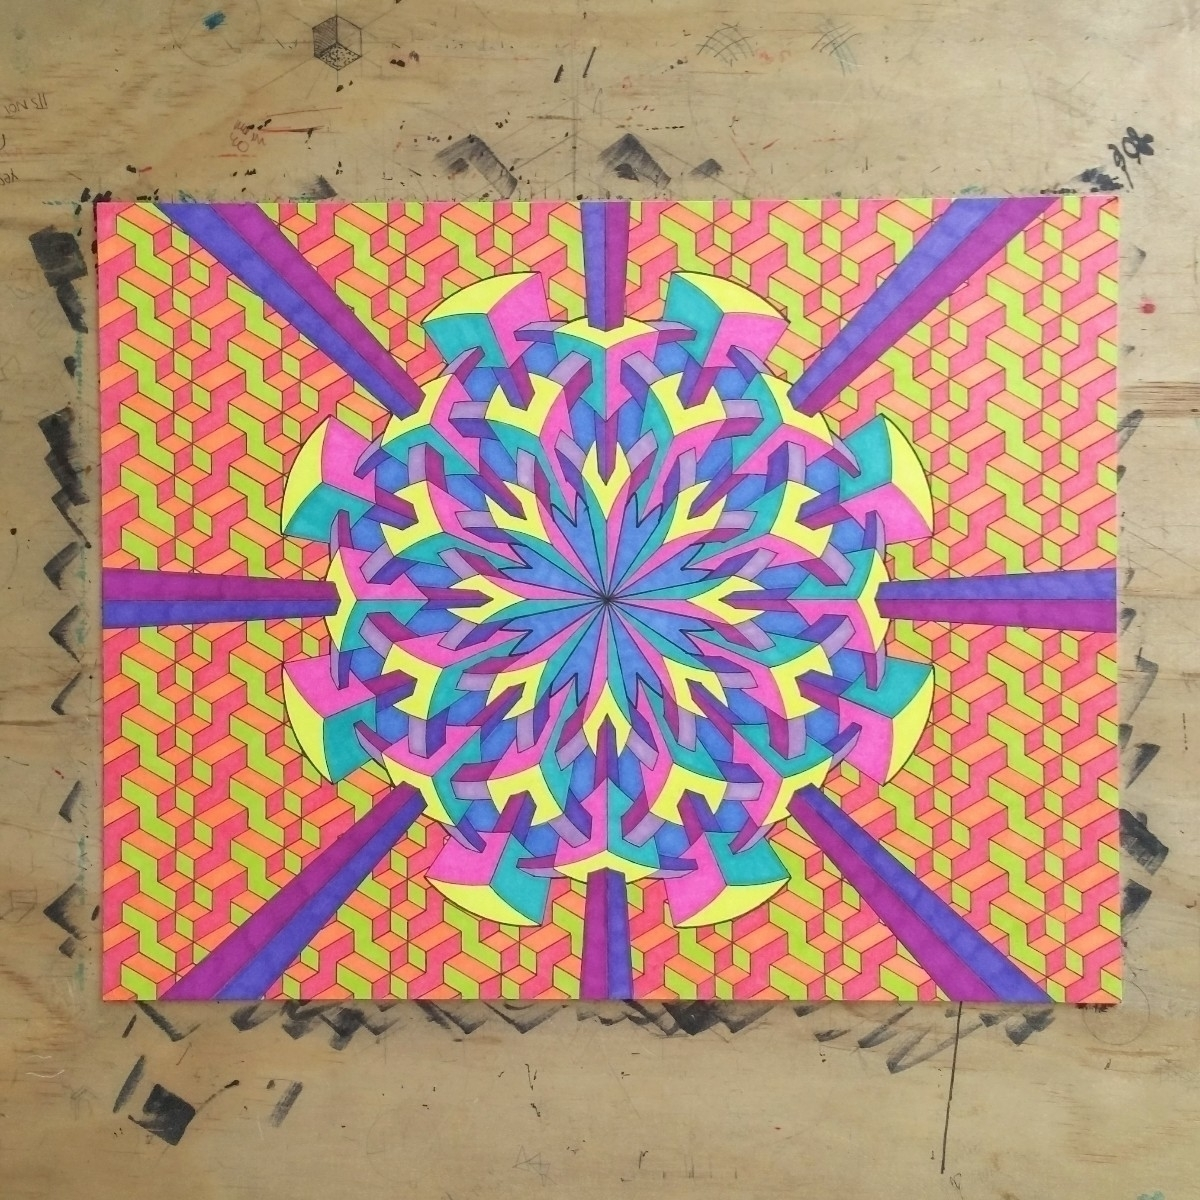 Older drawing favorites - geometry - zzzack | ello